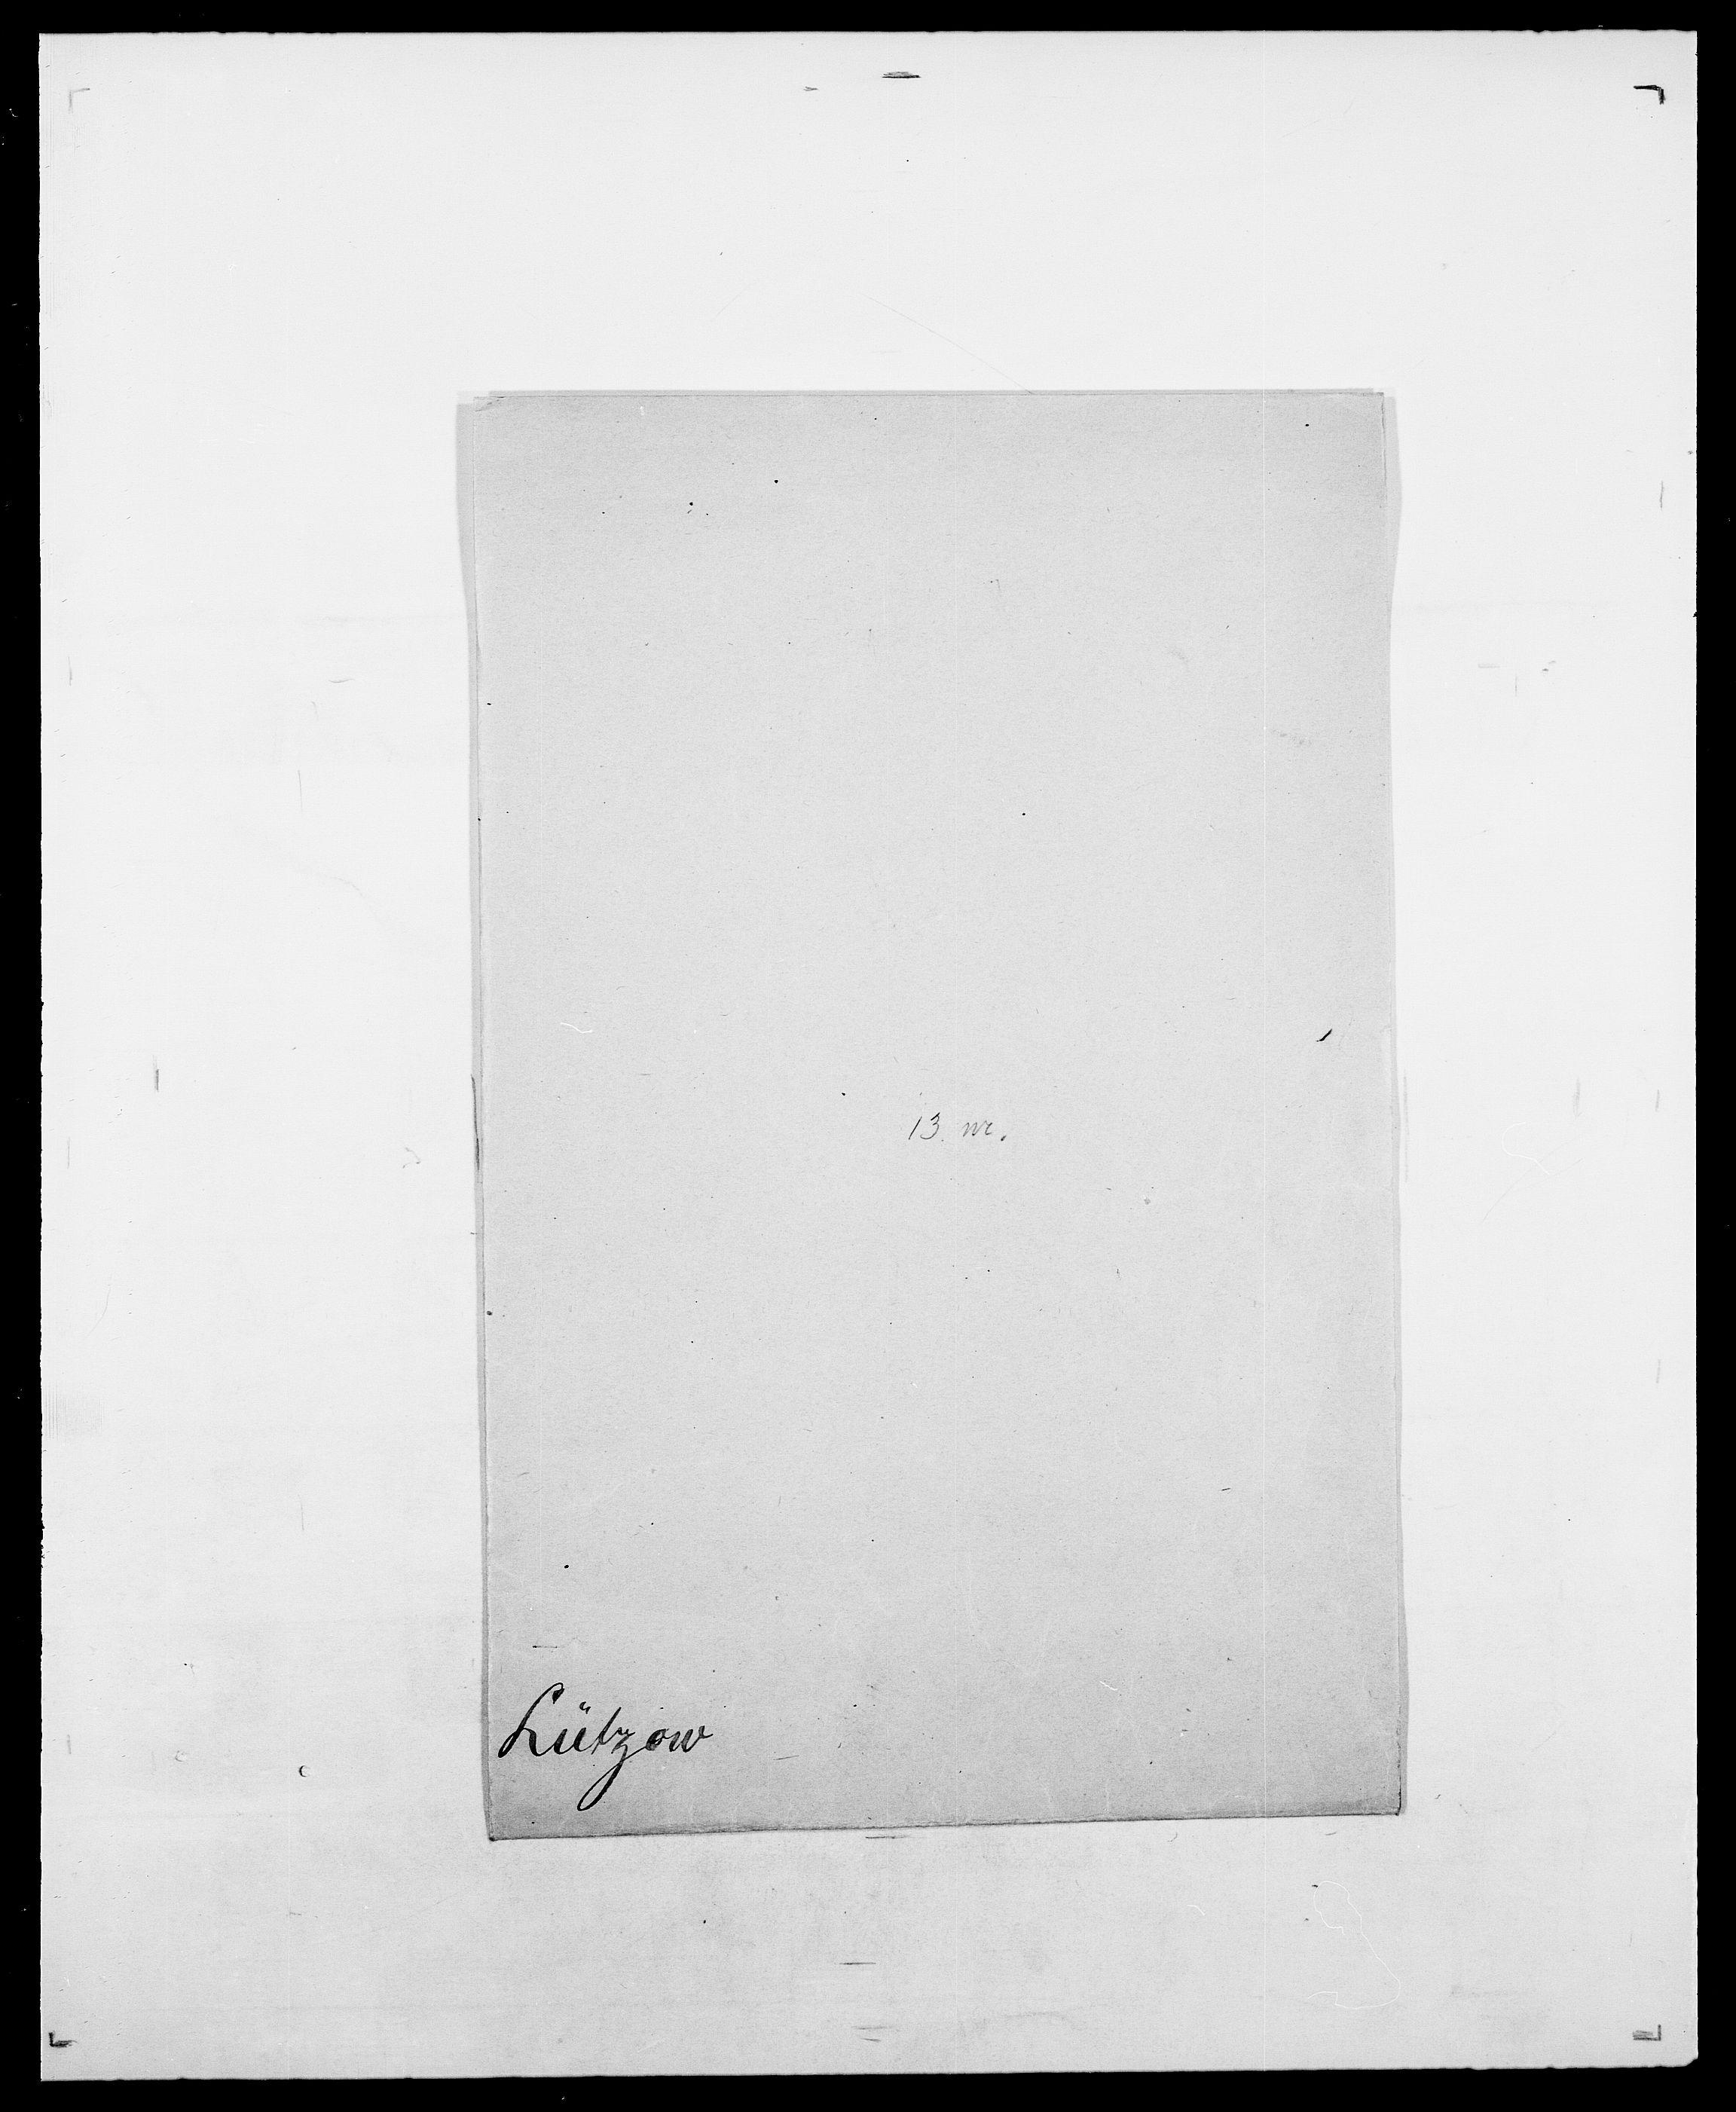 SAO, Delgobe, Charles Antoine - samling, D/Da/L0024: Lobech - Lærum, s. 816